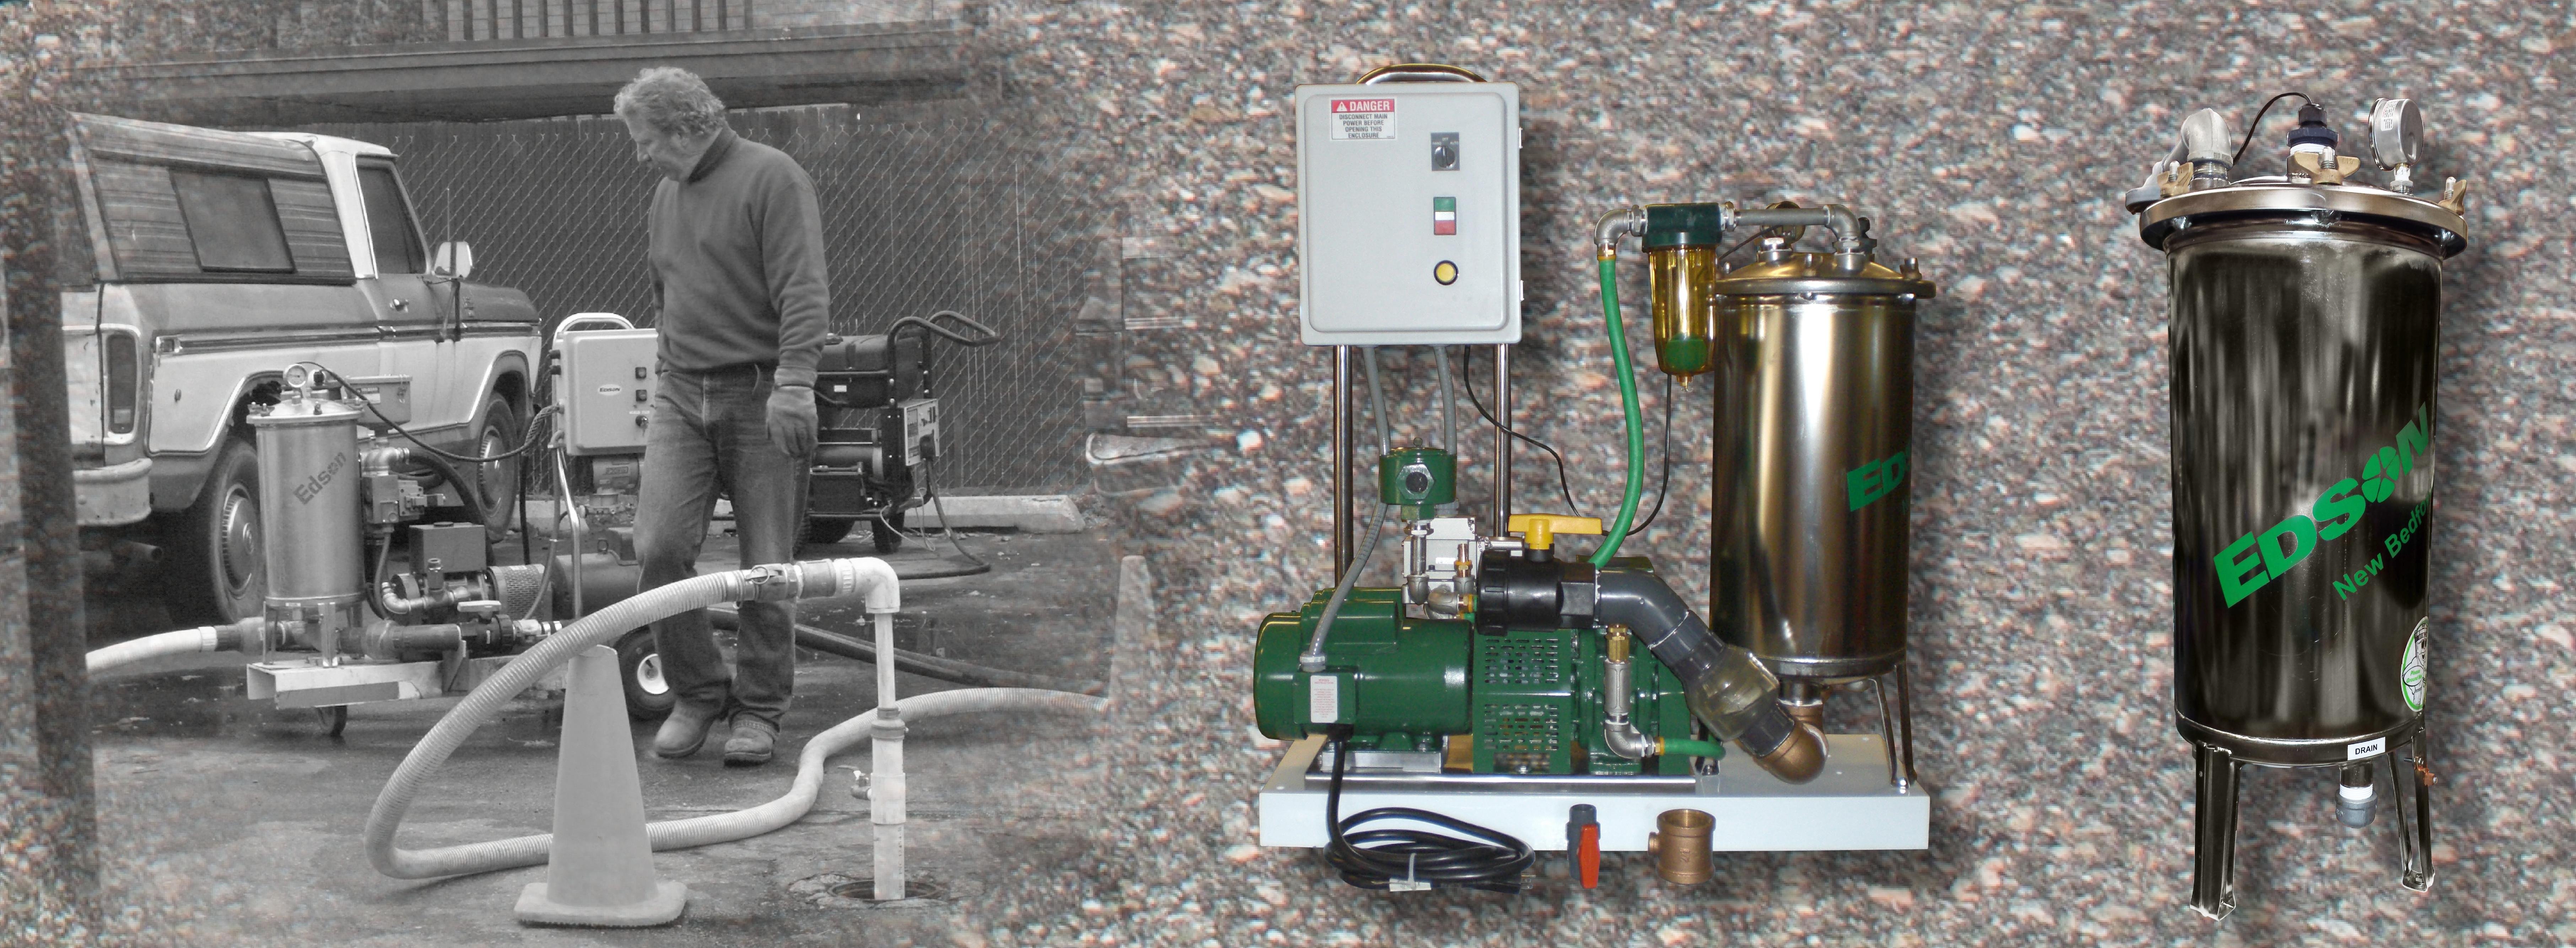 vacuum-pump-parts-page-banner-small.jpg